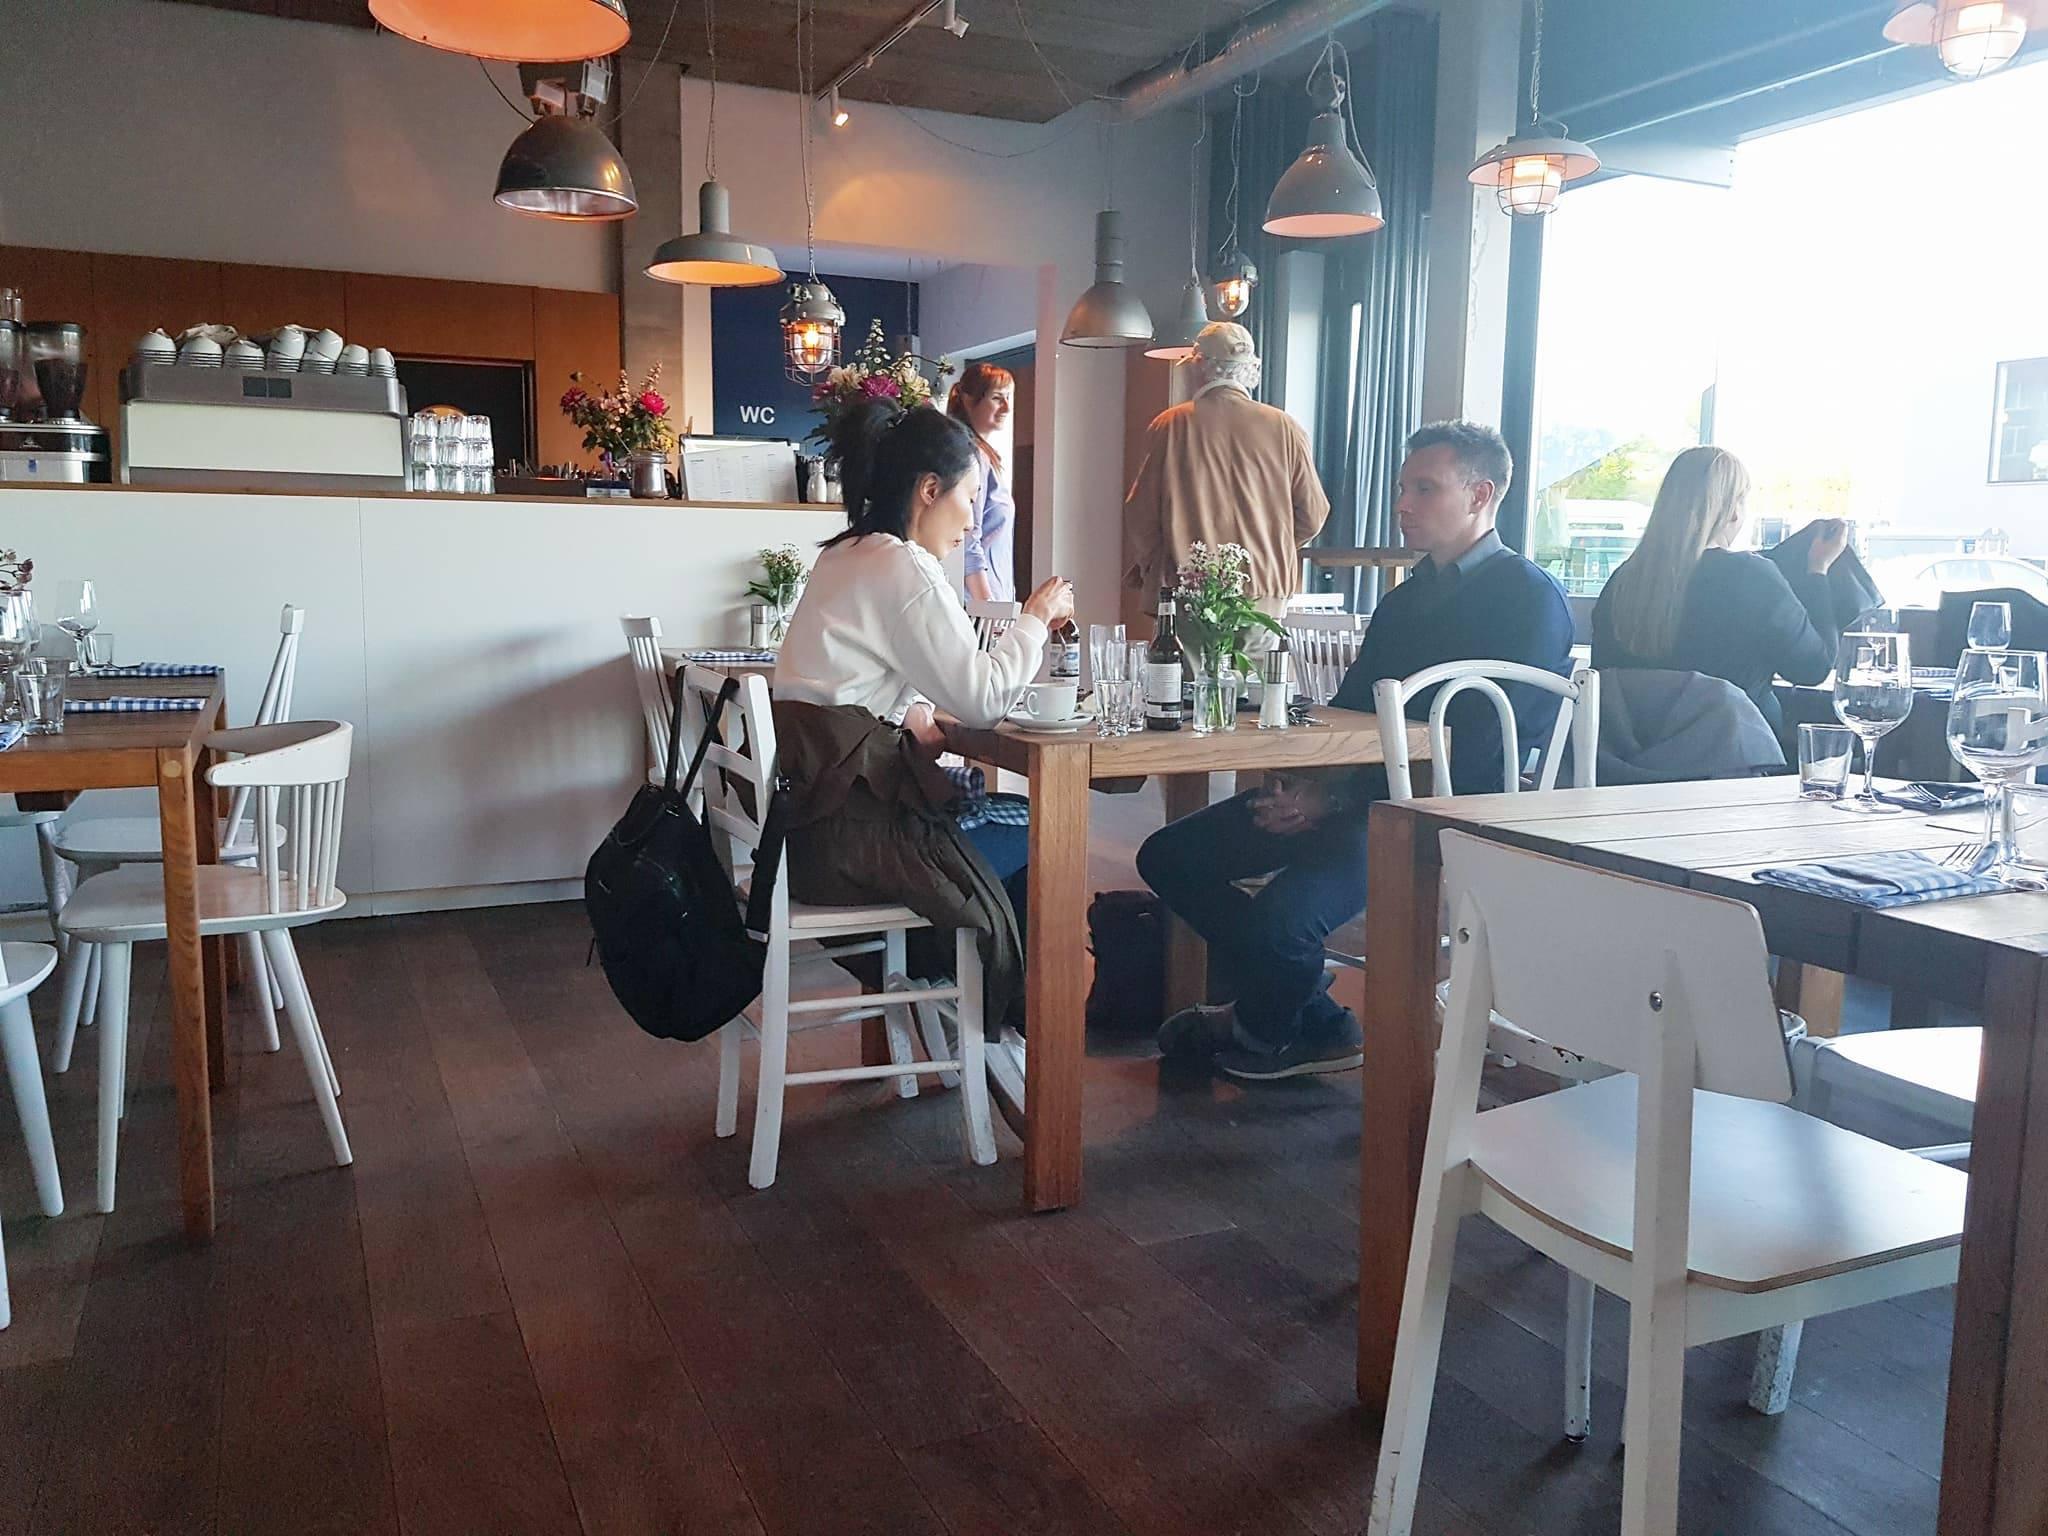 restaurant Berlin, hafenküche, hafenküche berlin, essen gehen berlin, essen berlin, ausgehen berlin, ausgehen, spree, spreeufer, boot fahren, boot berlin, picknick, picknickkorb, boulderhalle berlin, wasser berlin, rummelsburg, rummelsburger bucht, locals berlin, insider berlin, inside berlin, insidertipps berlin, humus, burger berlin, burgerbraterei berlin, hausgemachte burger, design berlin, food concept berlin, essen fassen, lunch berlin, grillen berlin, grillen, outdoor berlin